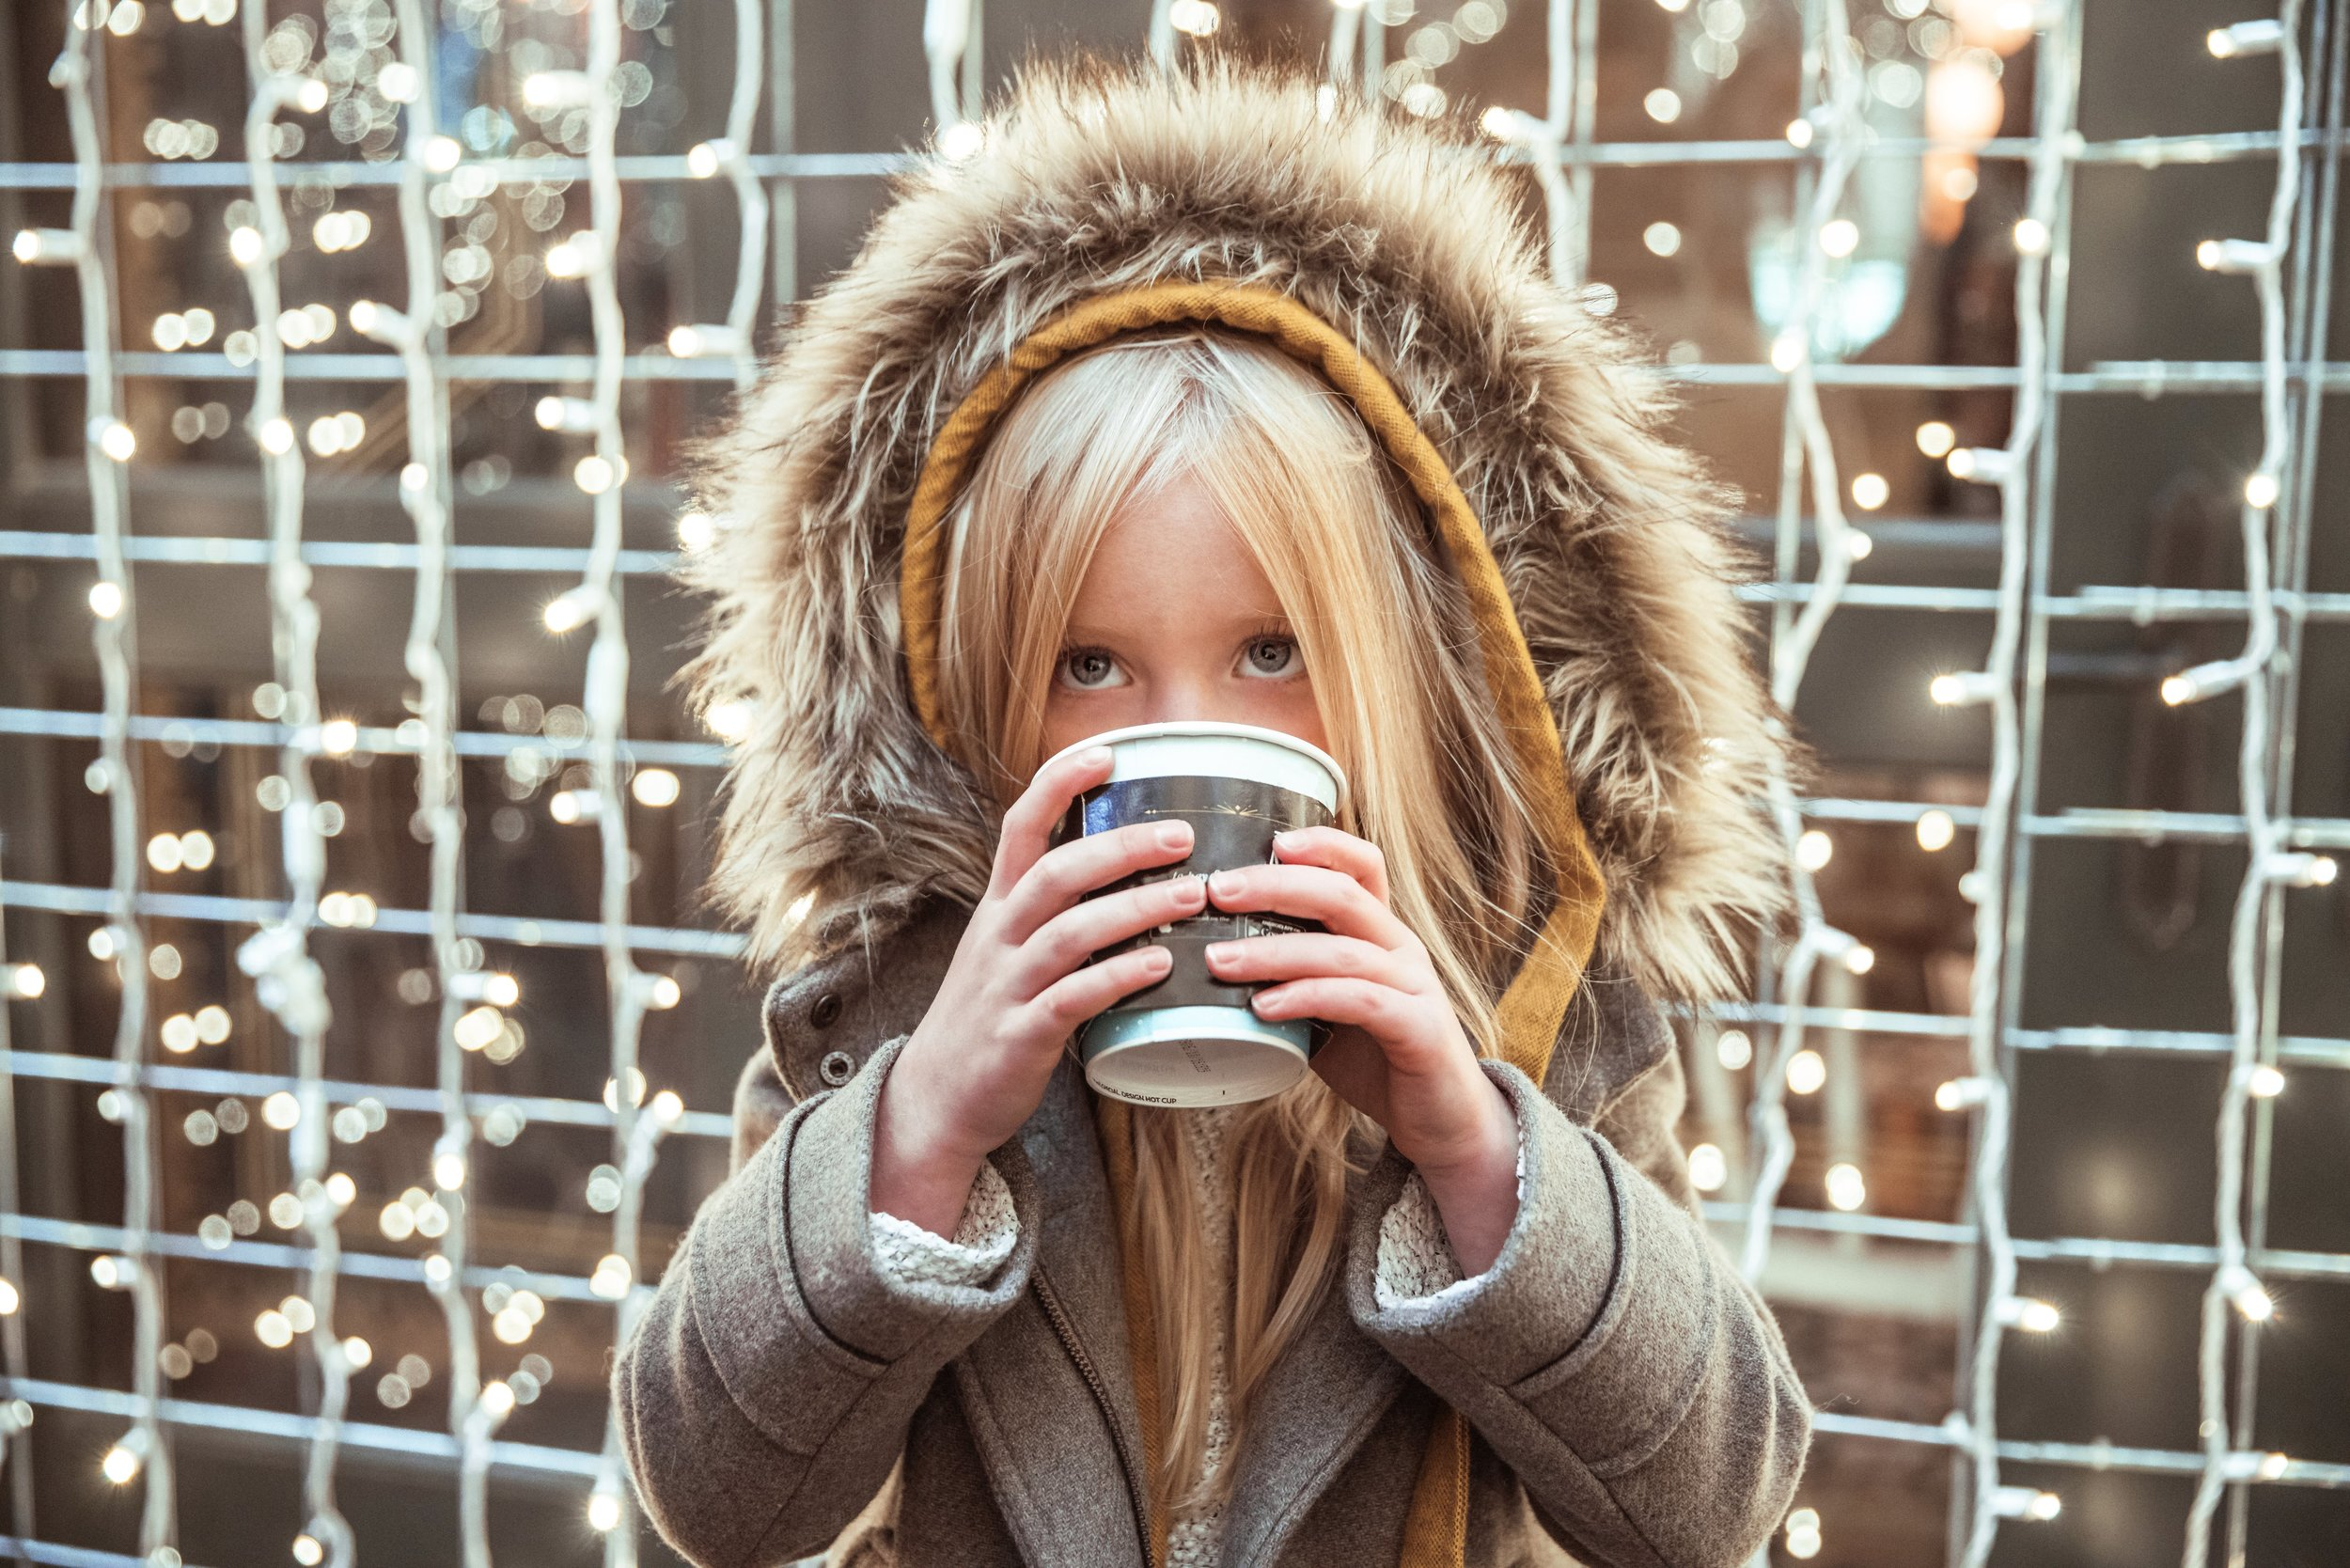 girl-drinking-hot-beverage_4460x4460.jpg